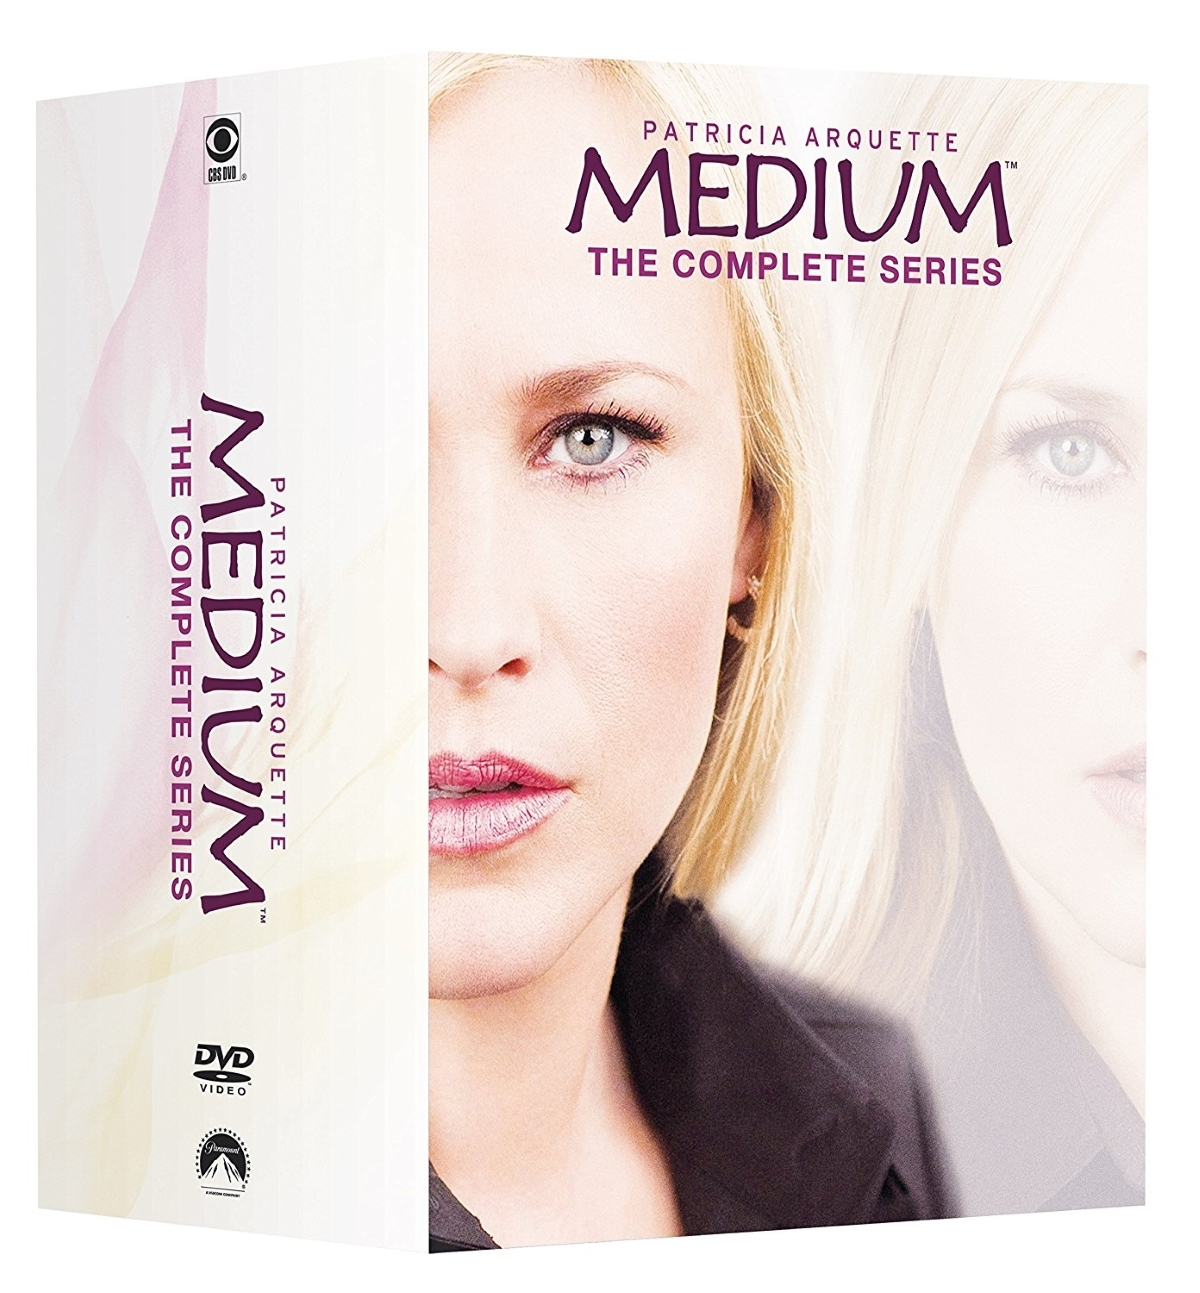 Medium the complete series season 1 7  dvd 2017  35 disc  1 2 3 4 5 6 7